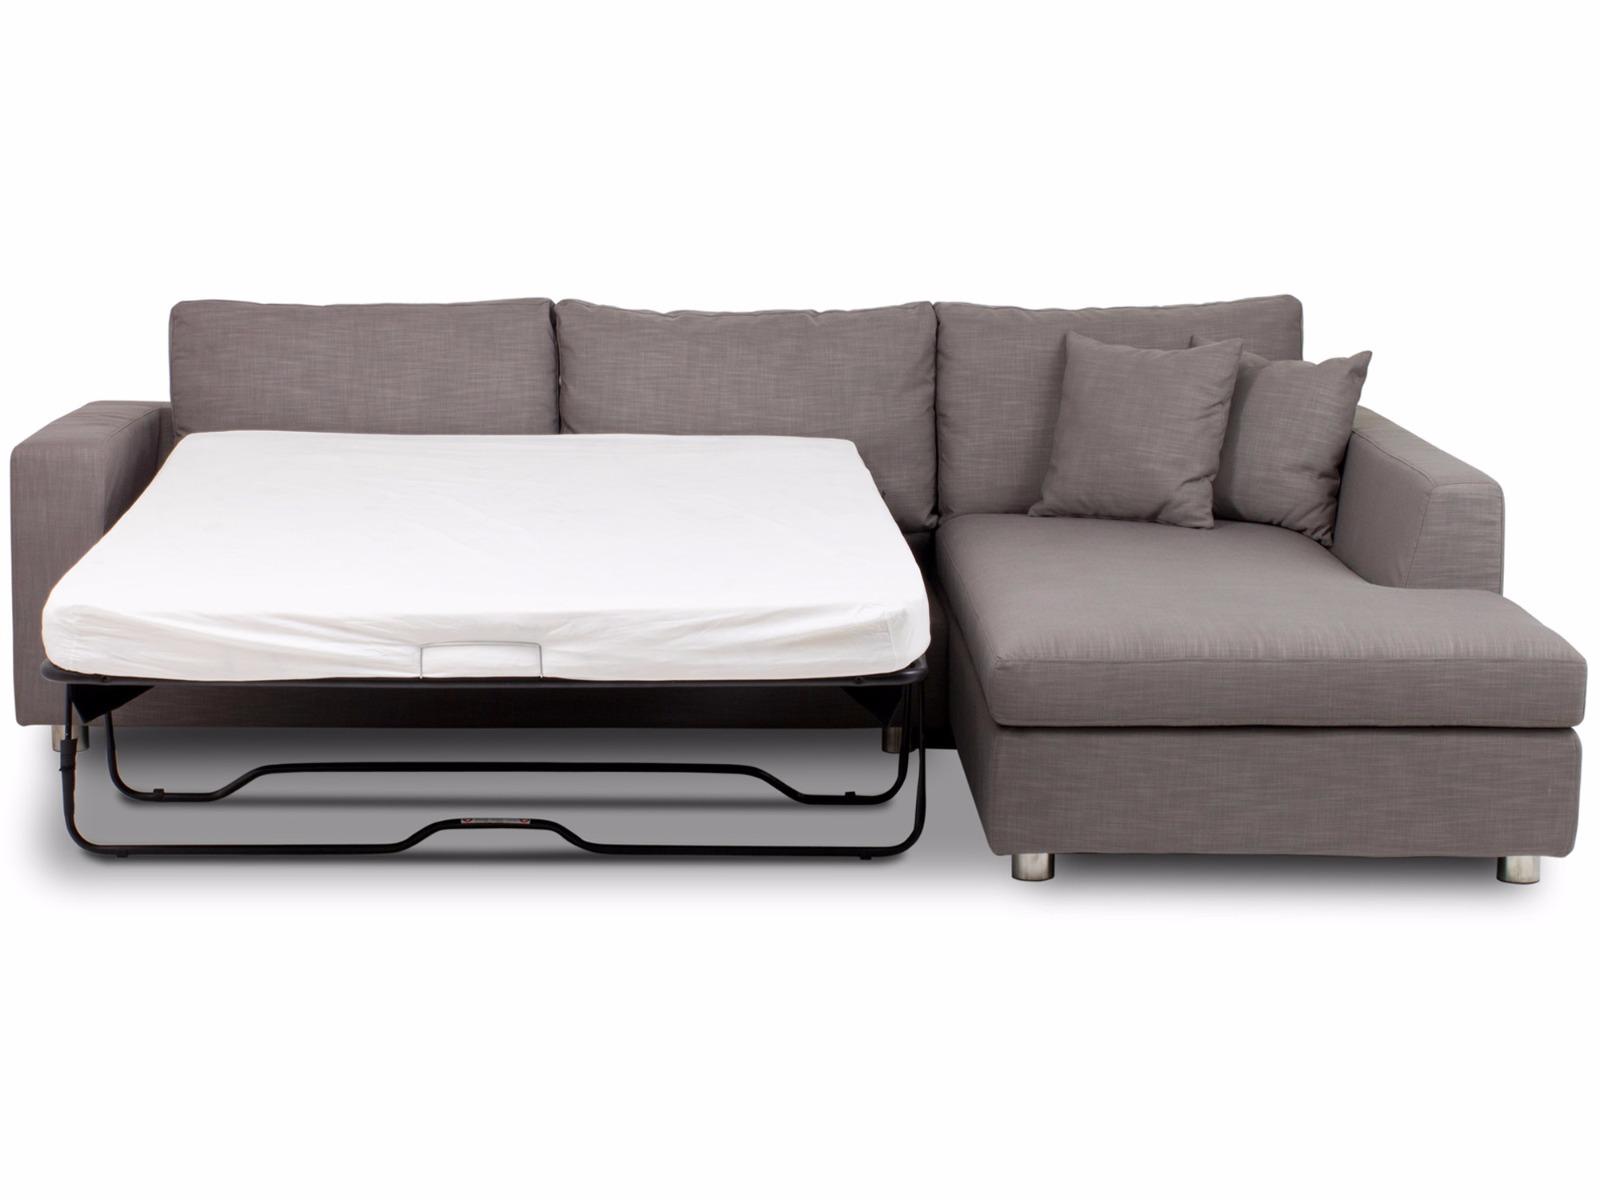 Full Size of Mondo Sofa Erfahrungen Kaufen Leder Online Softline Bed Bertinoro Agata Meble Capocolle Group Srl Couch 2 3 Seat Light Grey Fabric Canape Wildleder Türkische Sofa Mondo Sofa